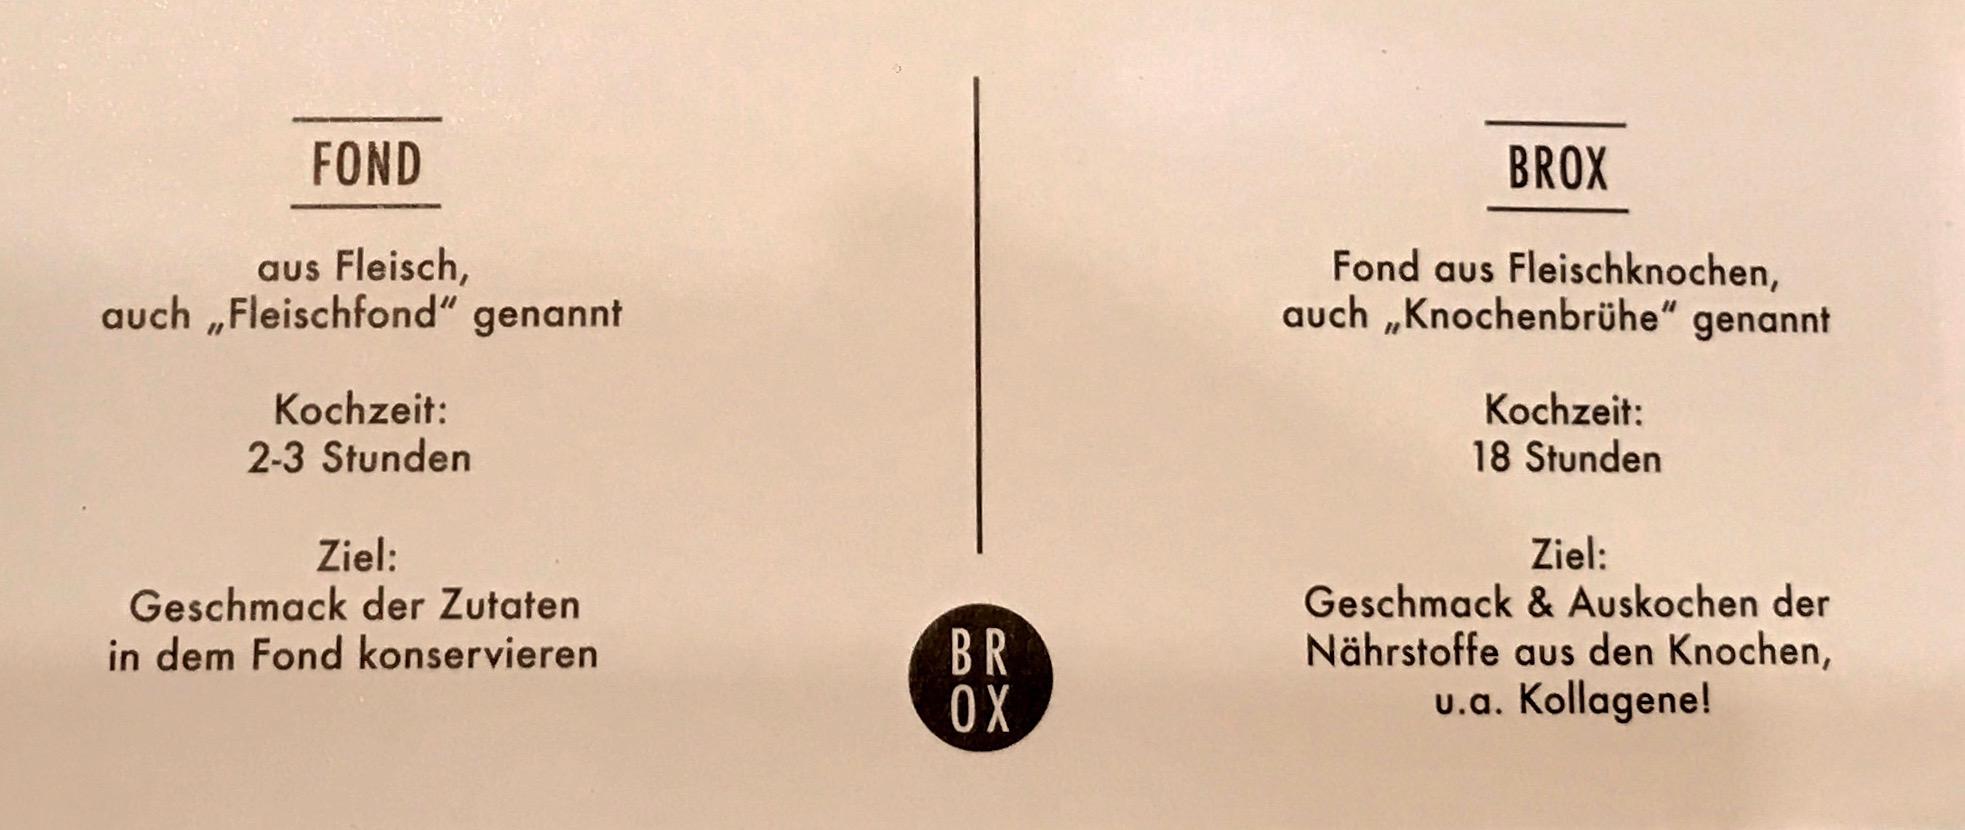 Brox-Knochenbrühe Banderole